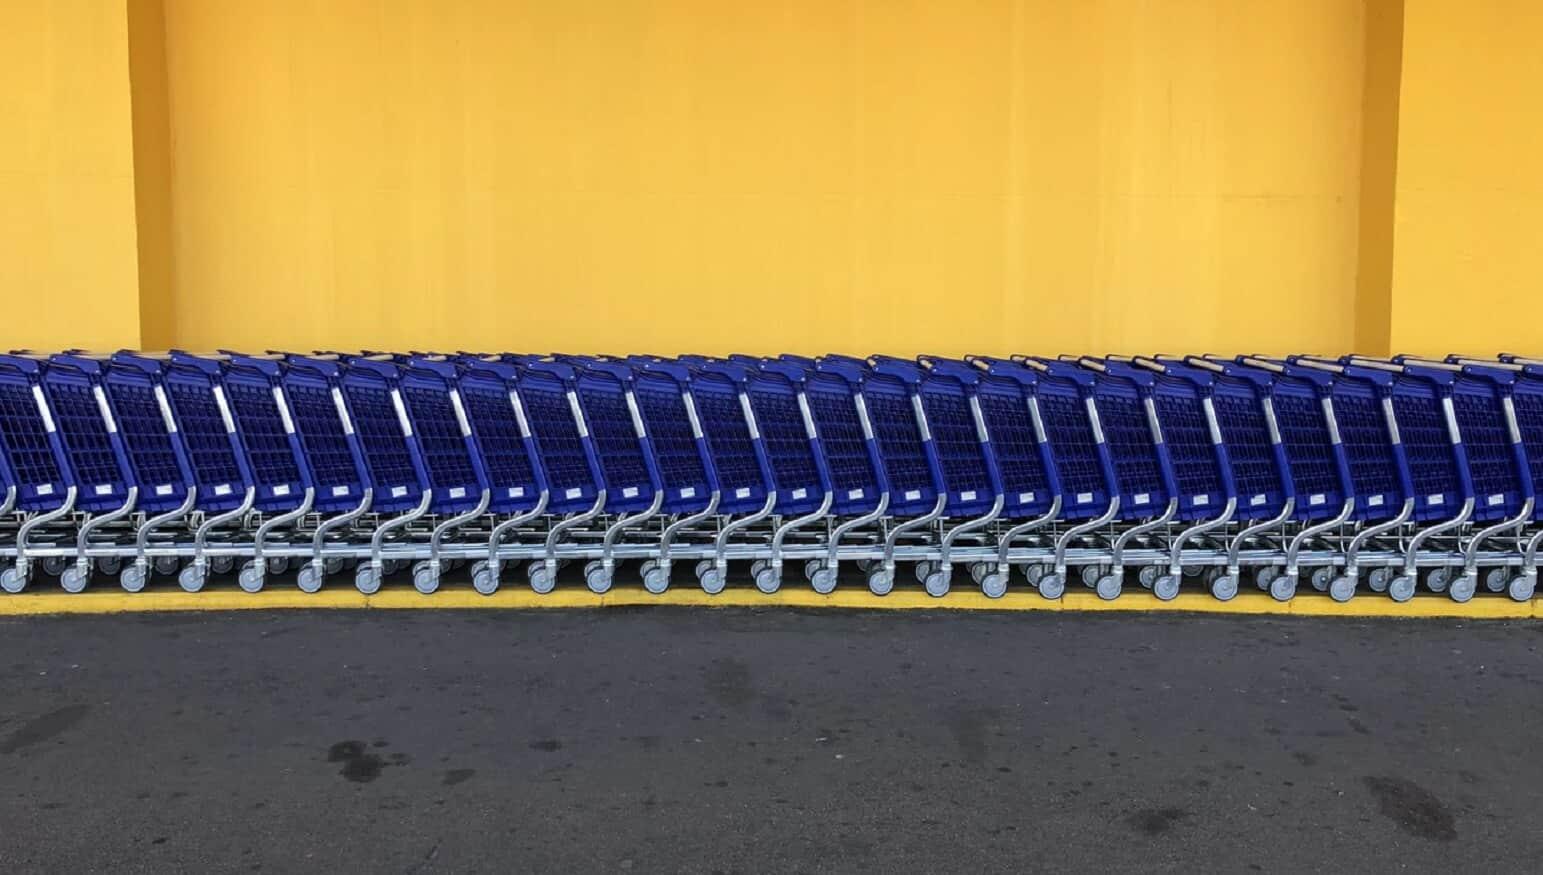 walmart shopping carts against yellow wall